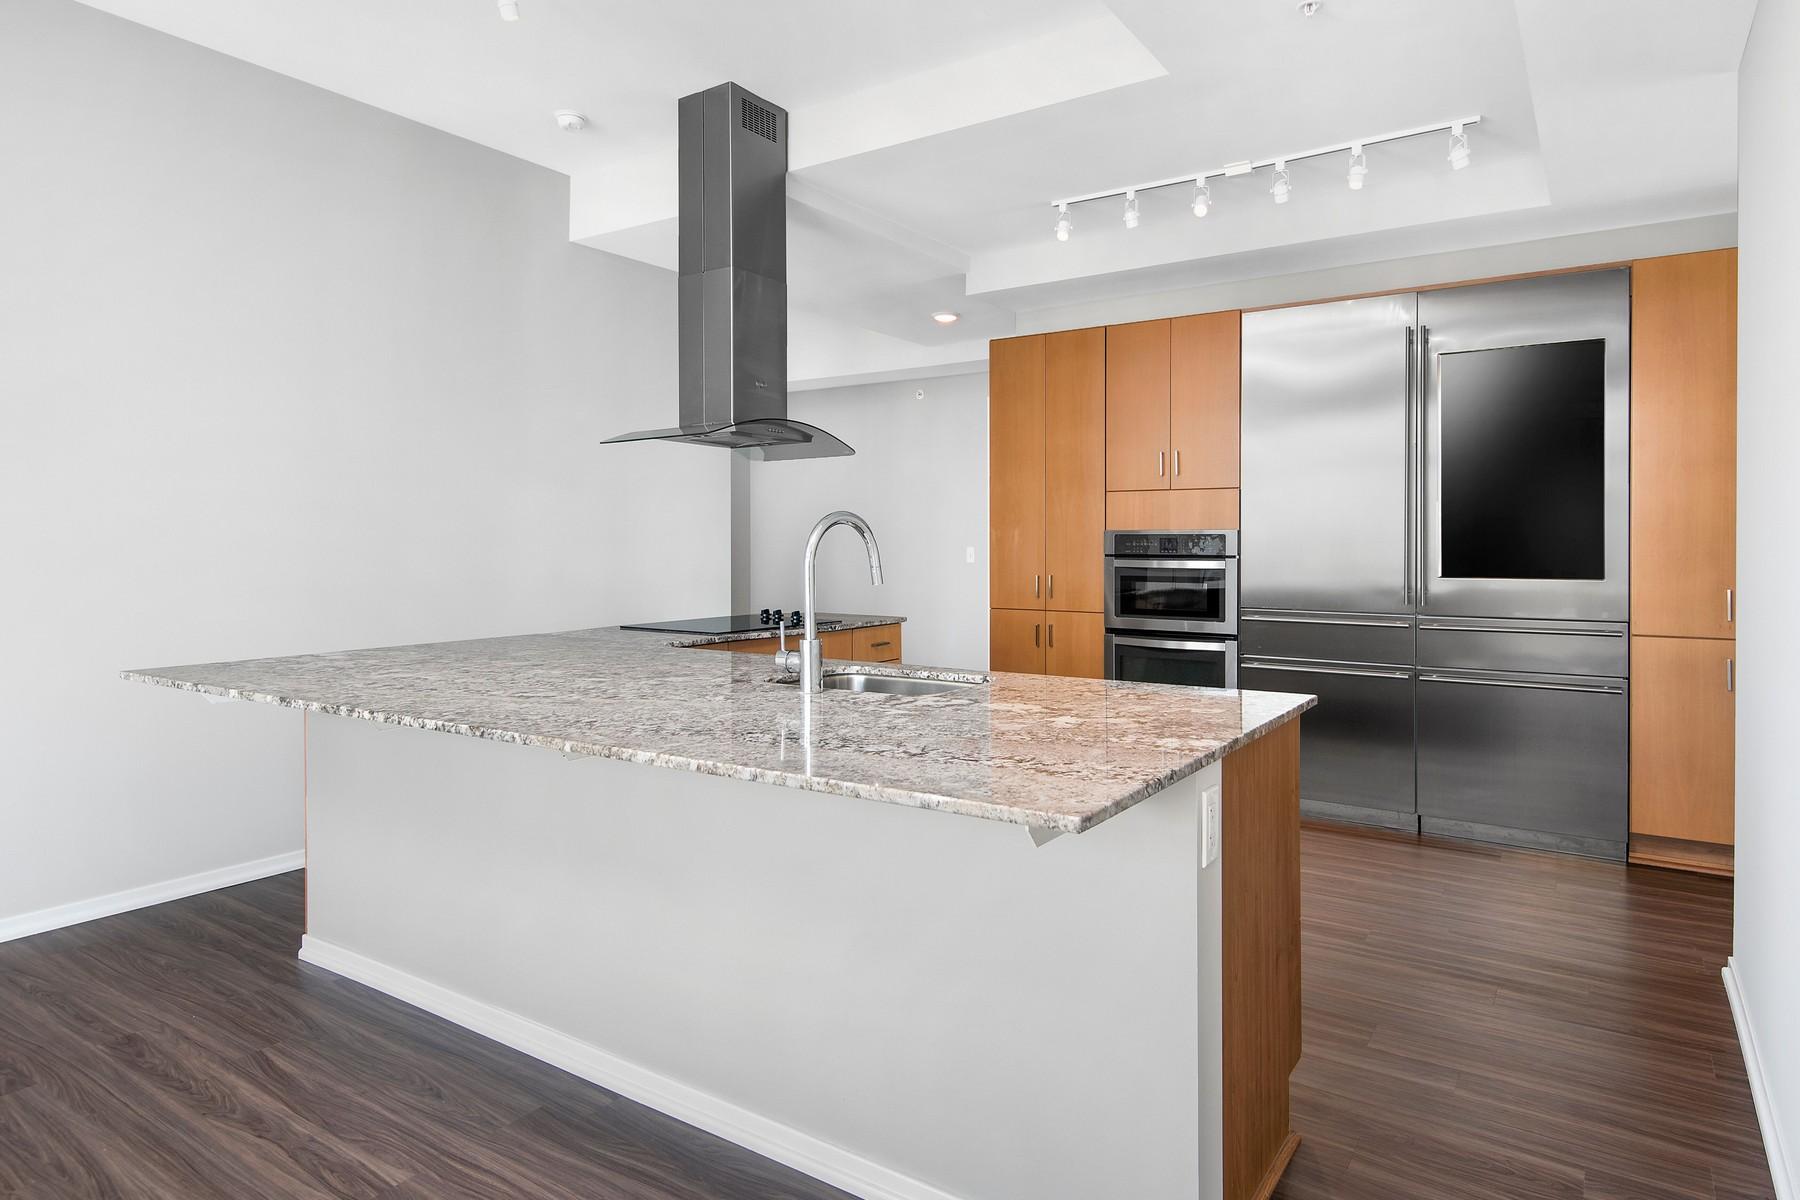 Condominiums for Rent at Aston Chicago 200 E Illinois St Chicago, Illinois 60611 United States